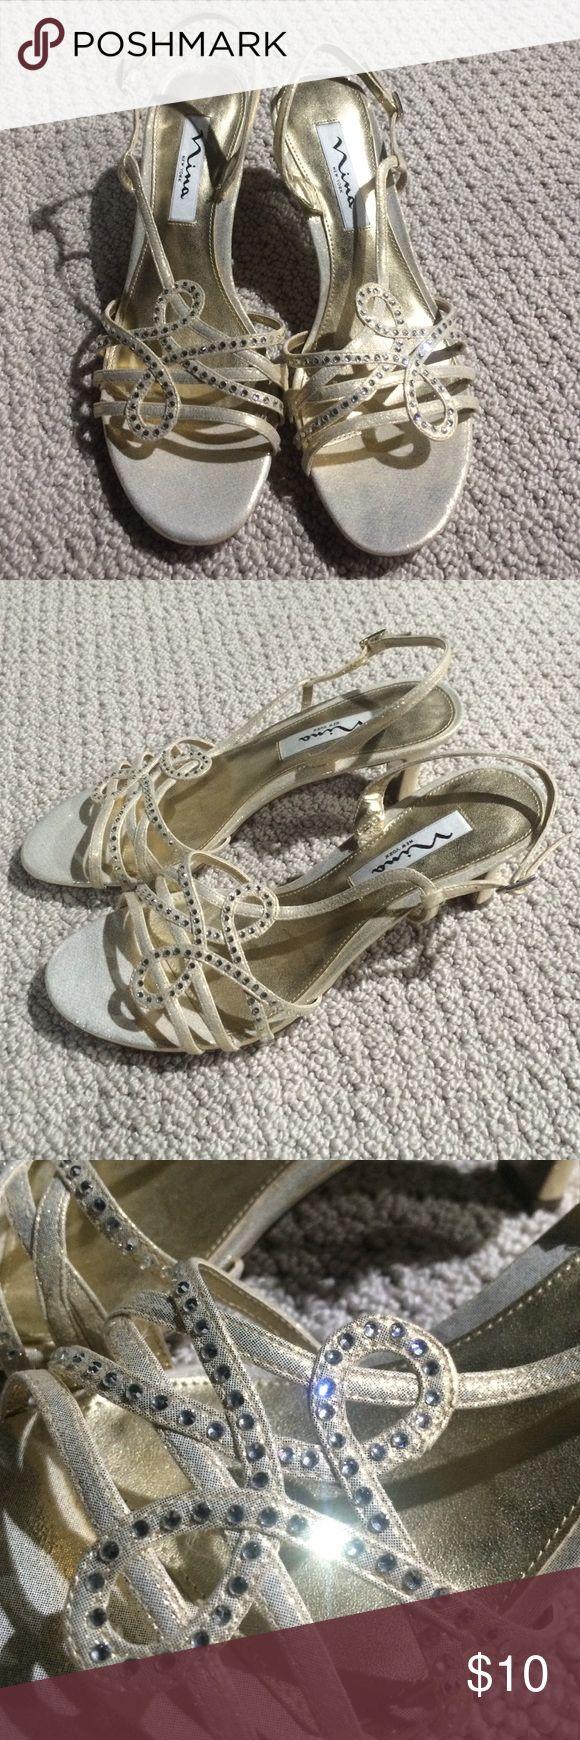 BRAND NEW NINA white and gold heels Nina brand strapped heel - brand new never worn! Nina Shoes Heels